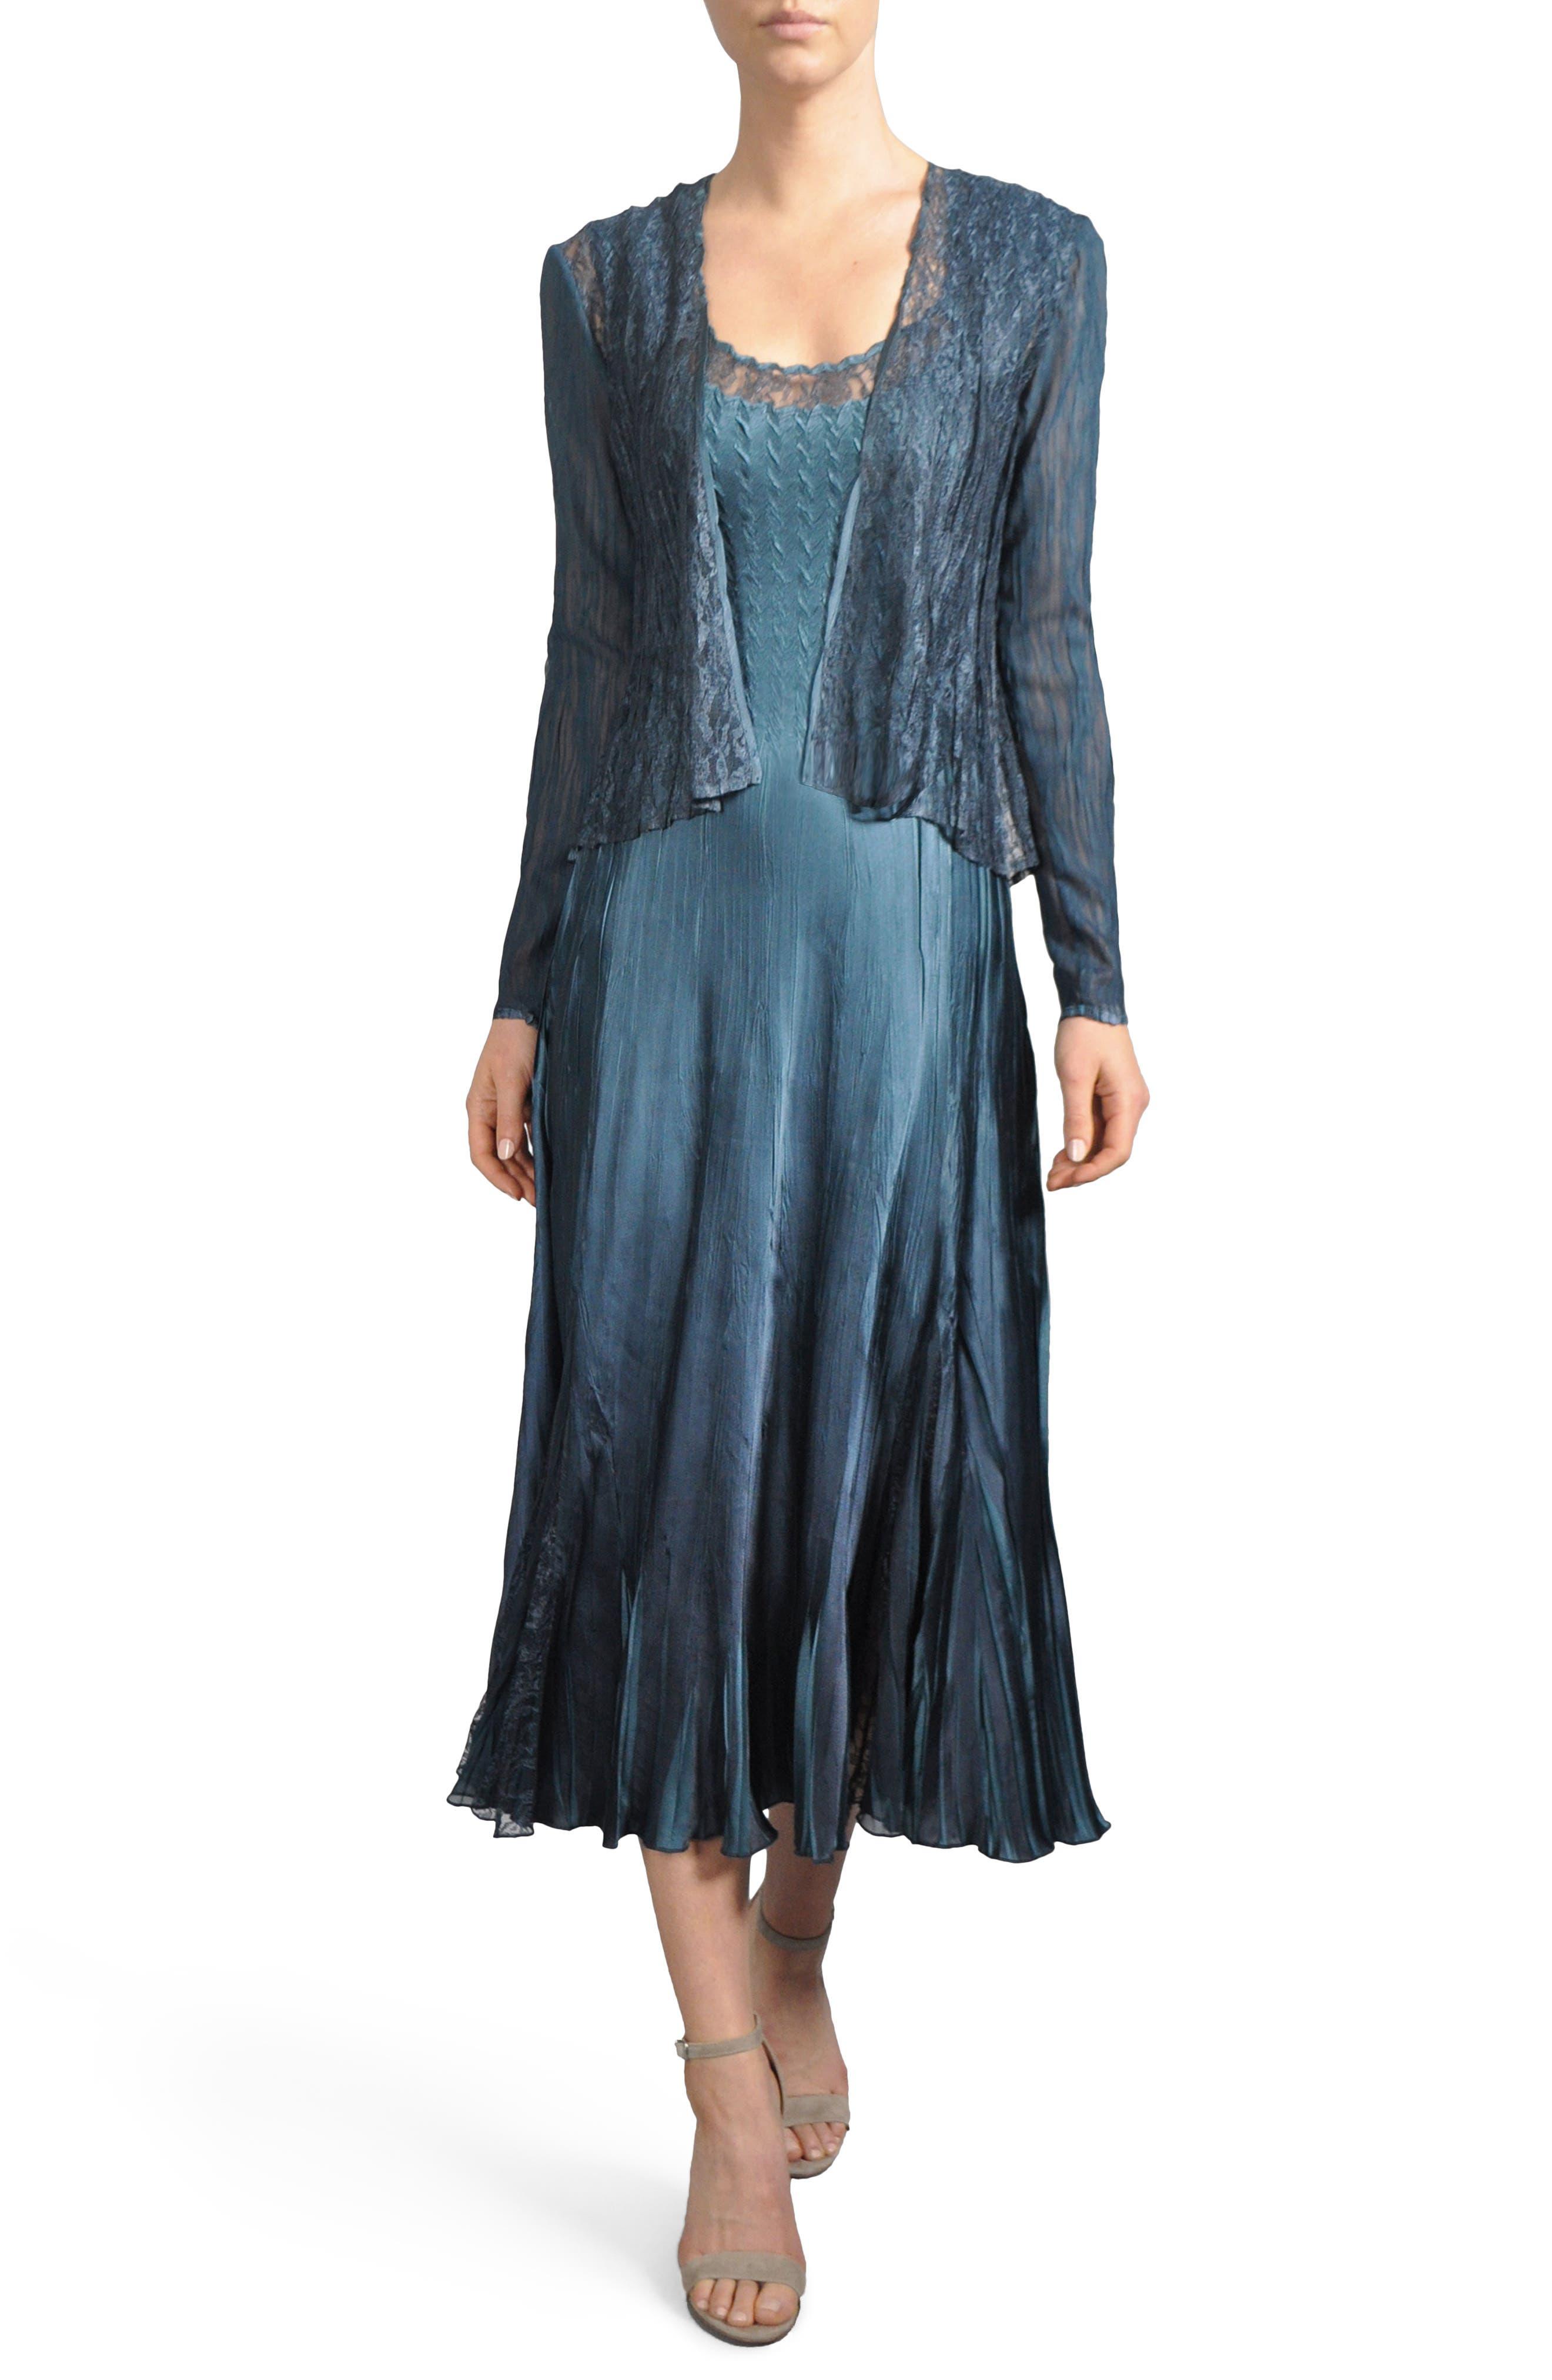 Main Image - Komarov Lace Inset Midi Dress with Jacket